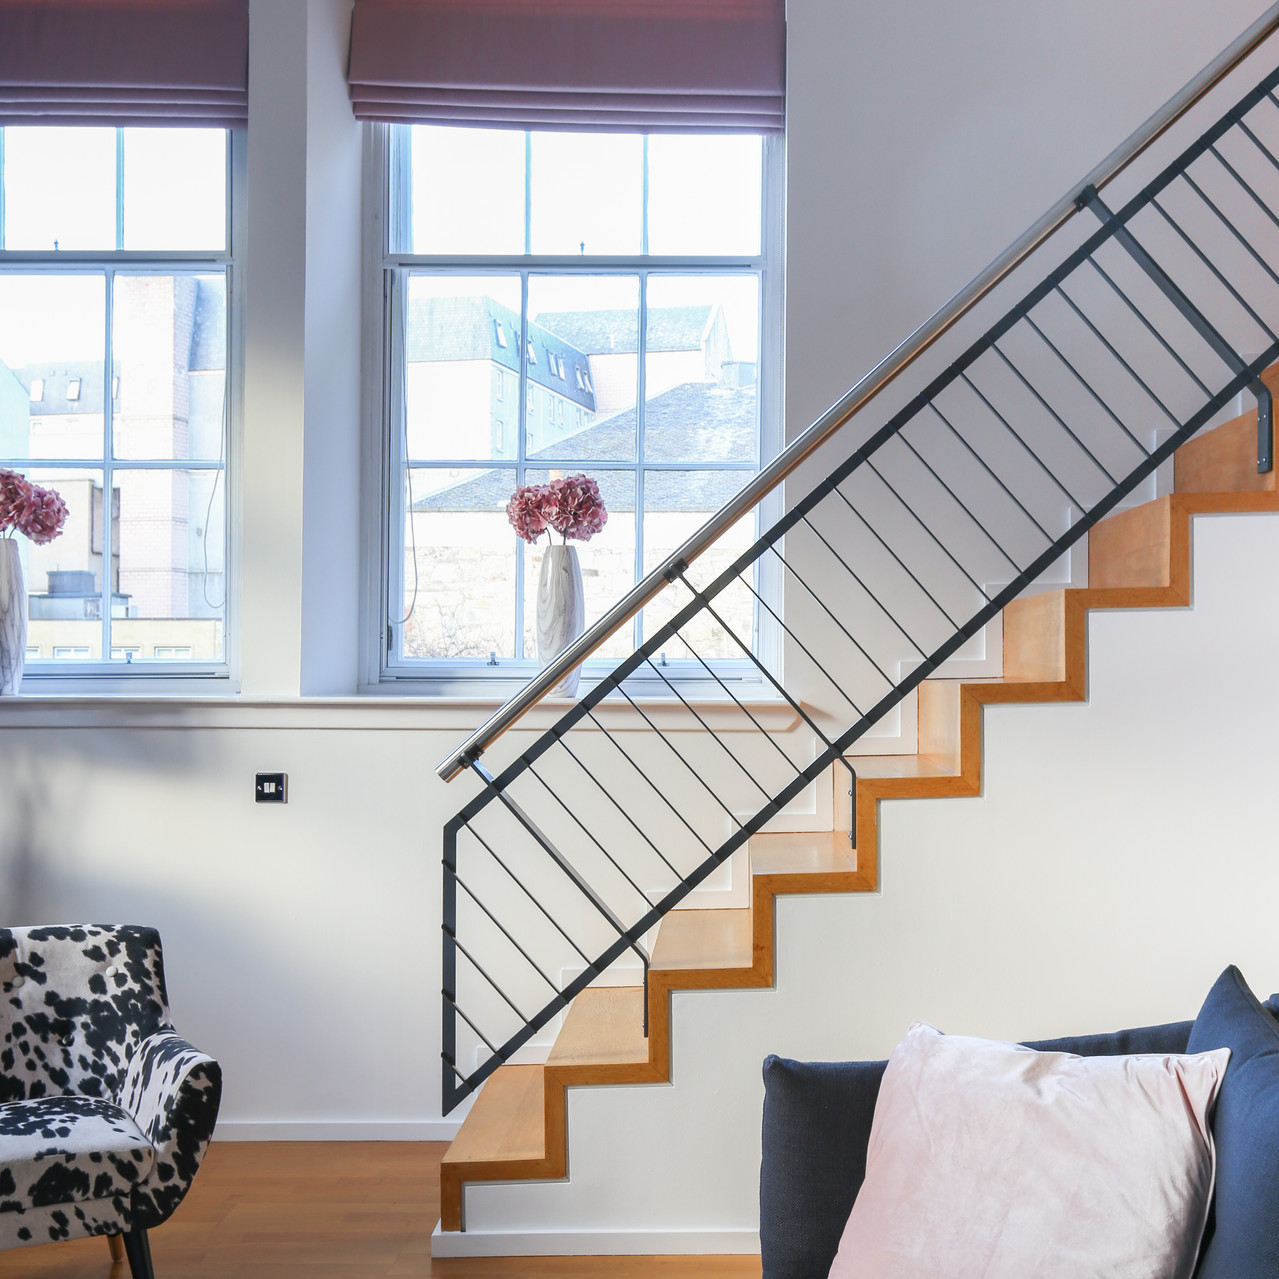 Interior photography staircase